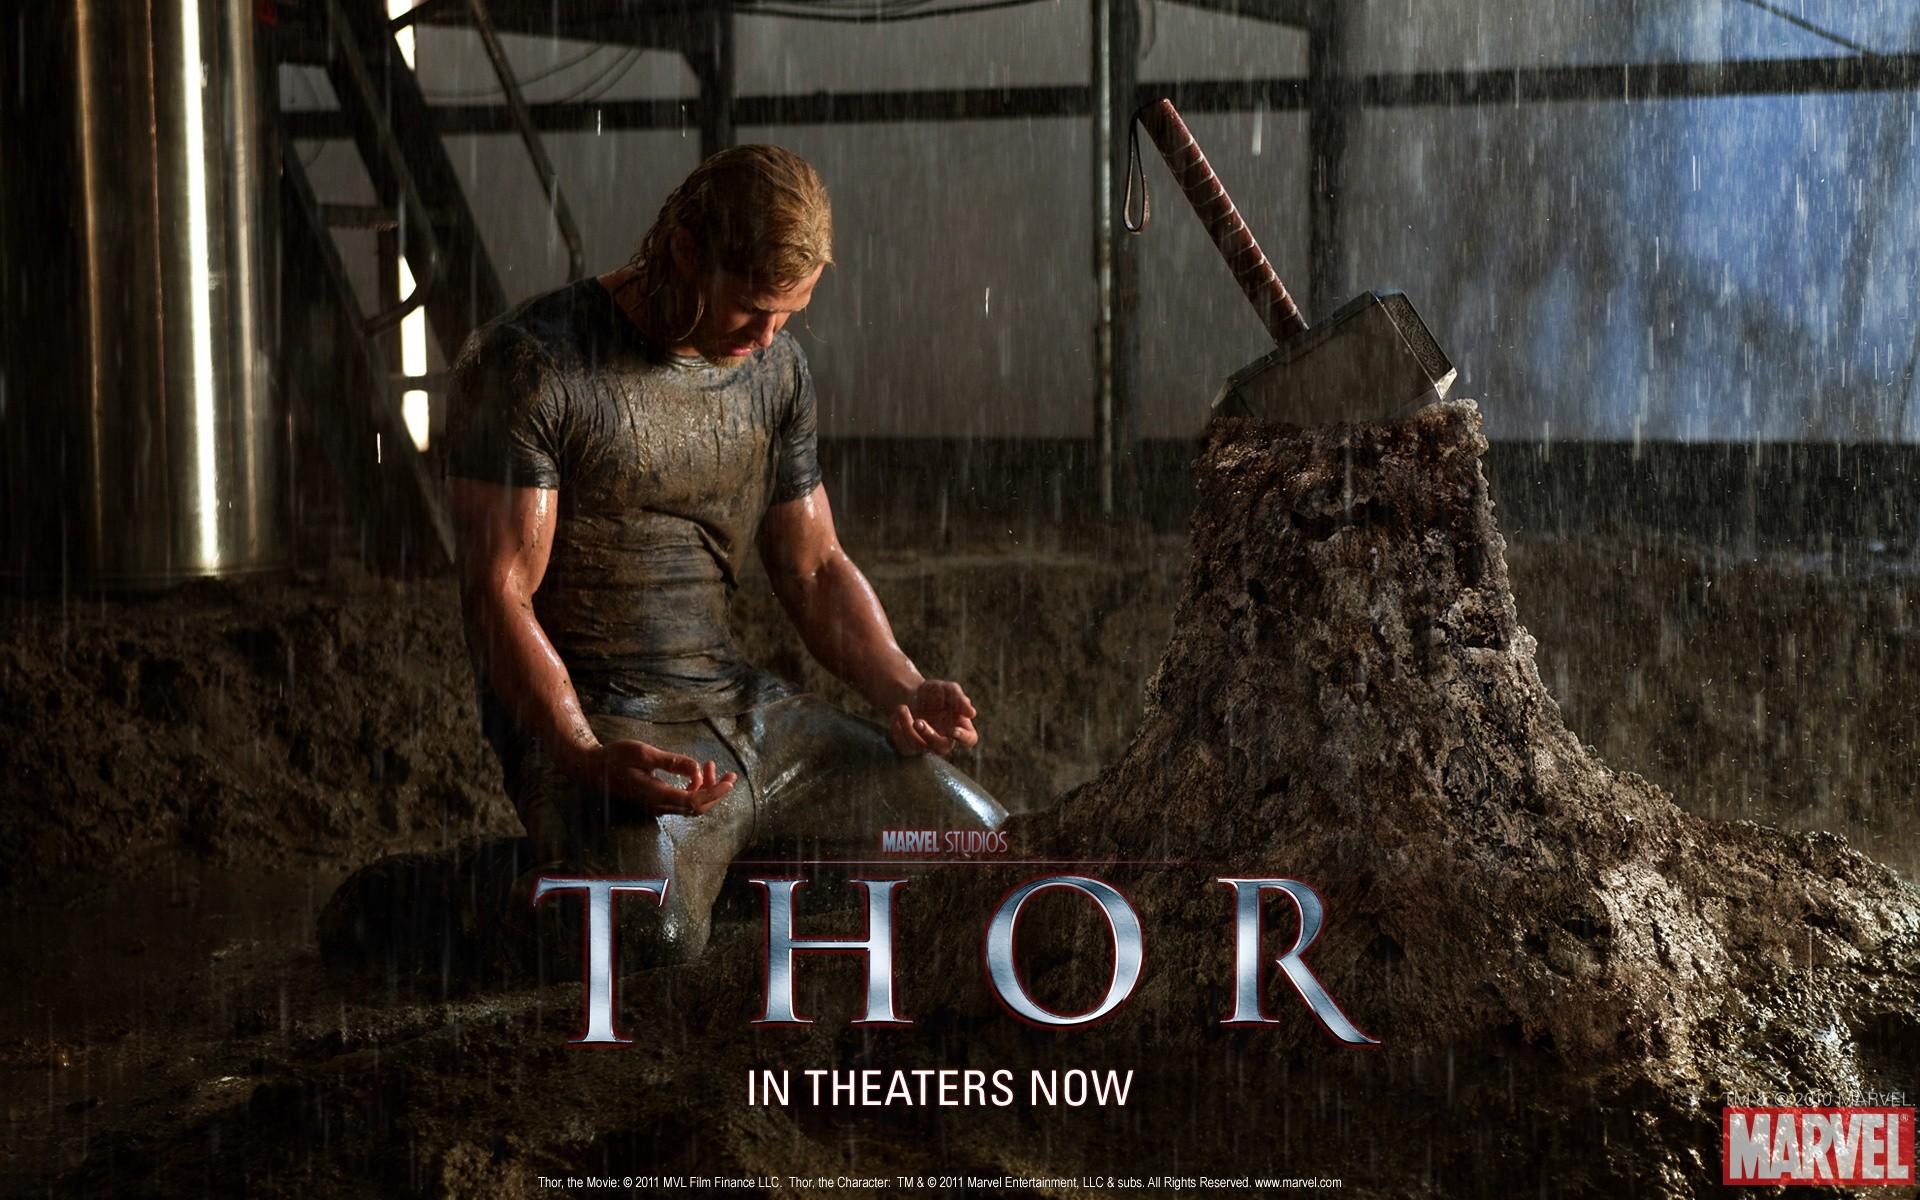 Good Wallpaper Marvel Thor - wallpaper_widescreen  Gallery_474644.jpg